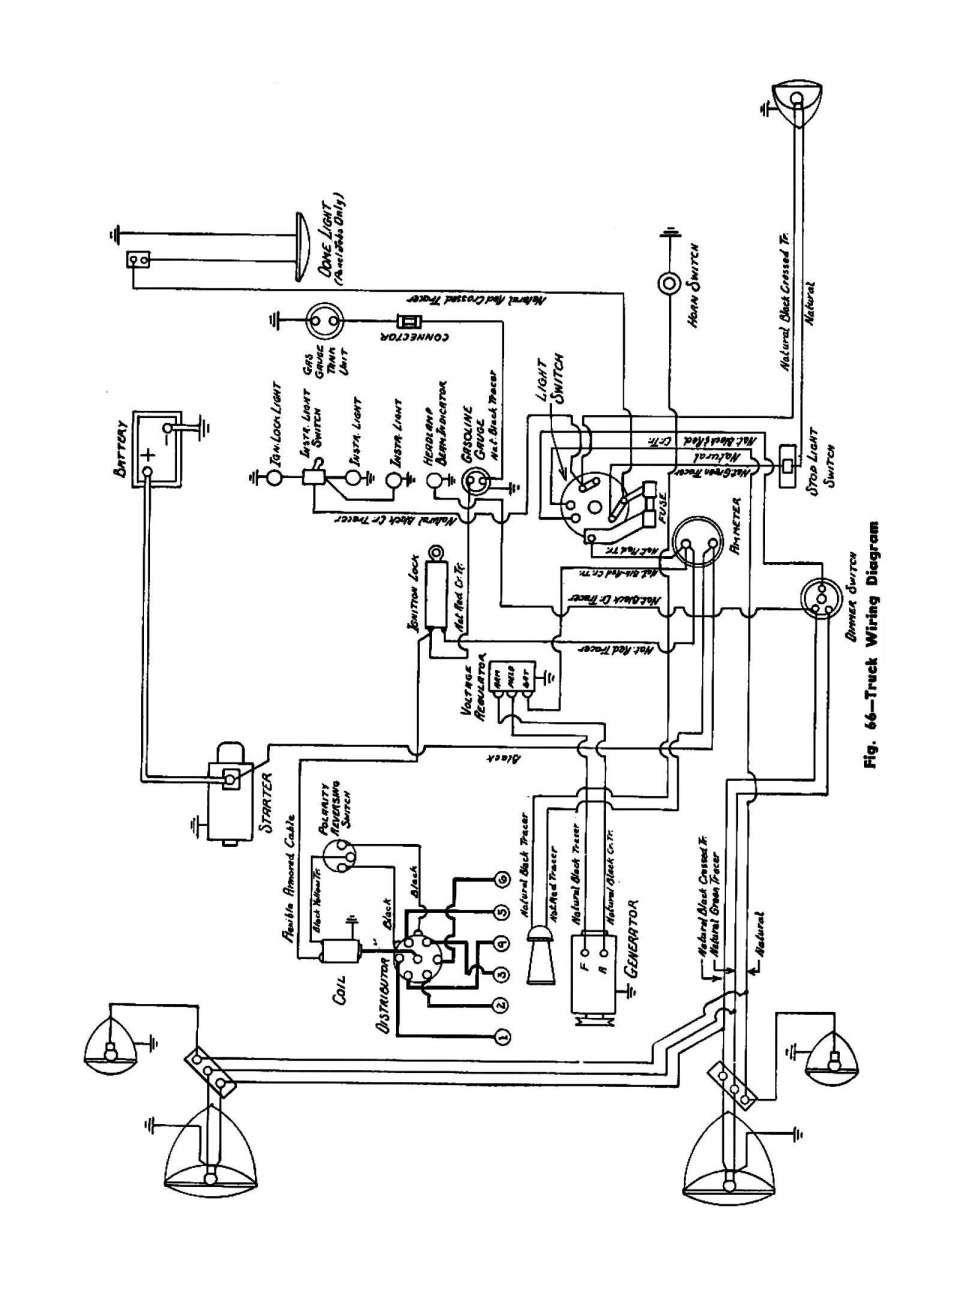 Pin on Truck Diagram